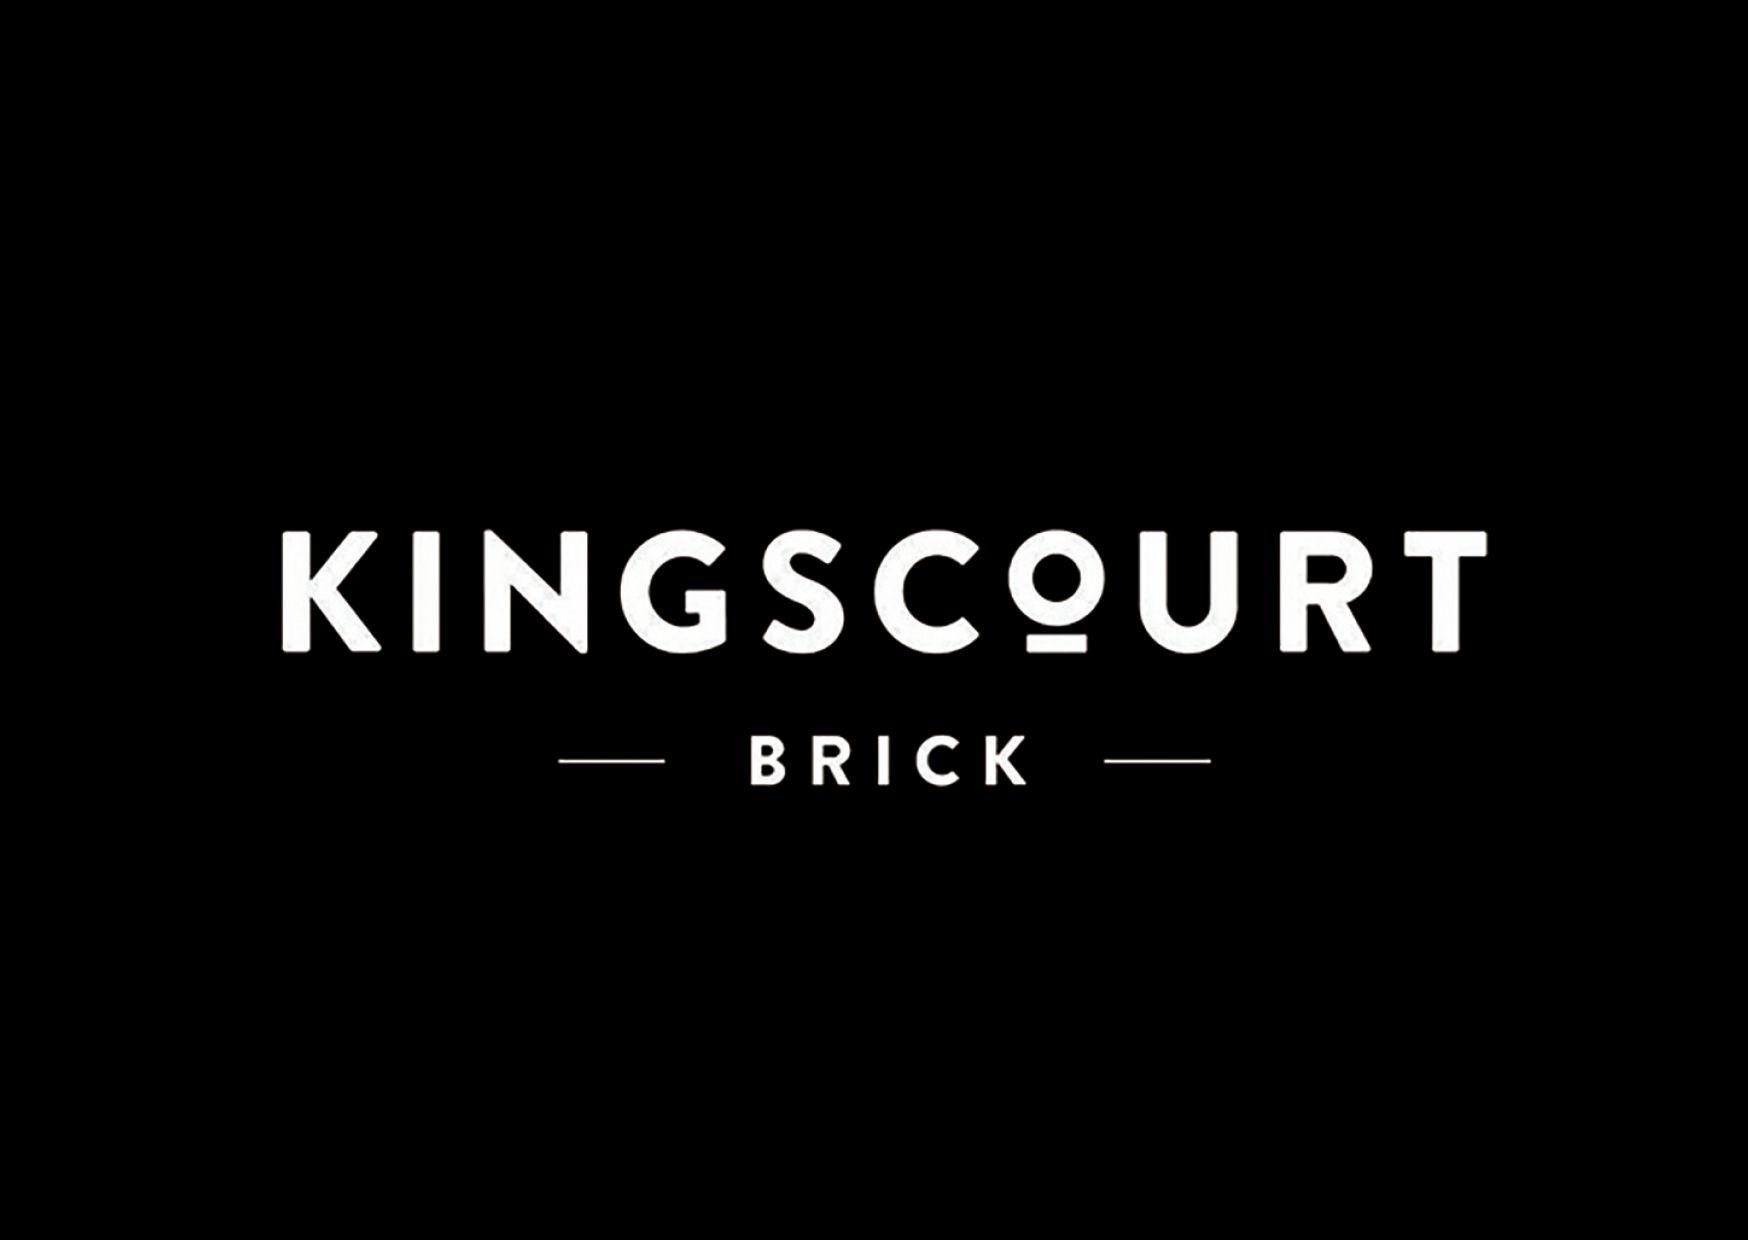 Kingscourt Brick